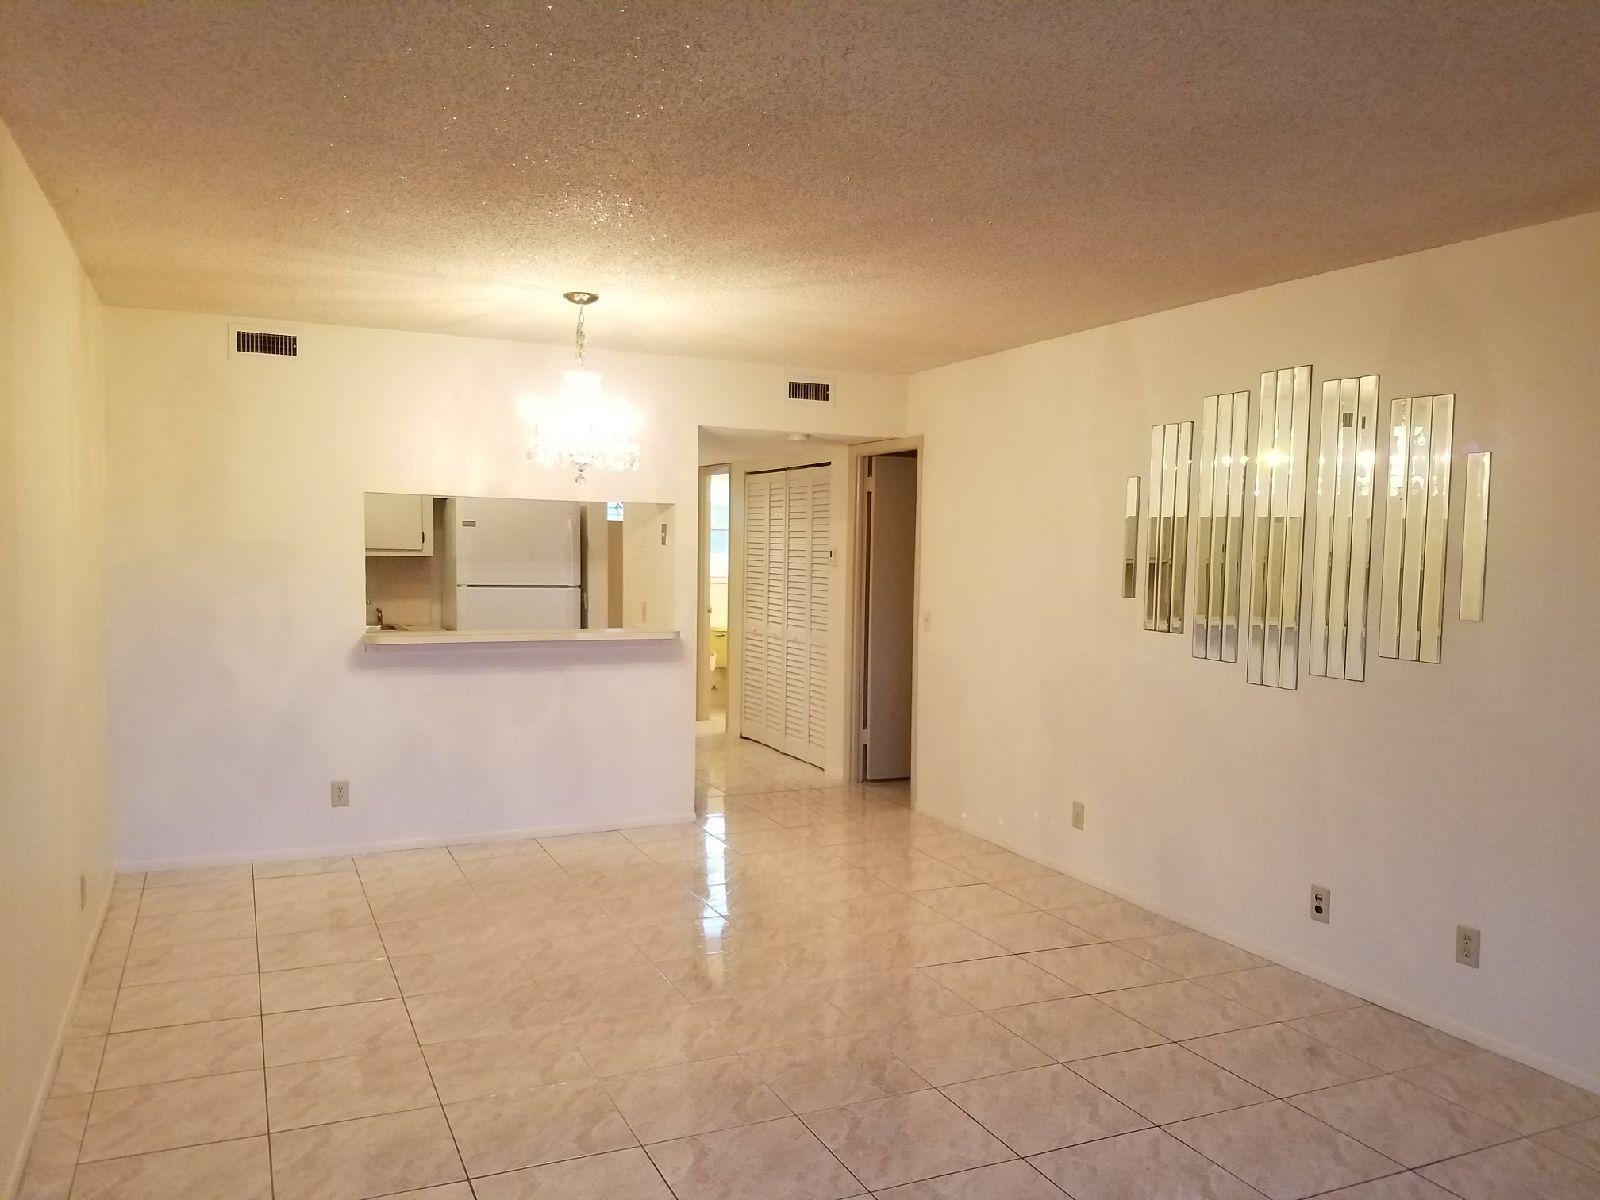 12005 Poinciana Boulevard 101 Royal Palm Beach, FL 33411